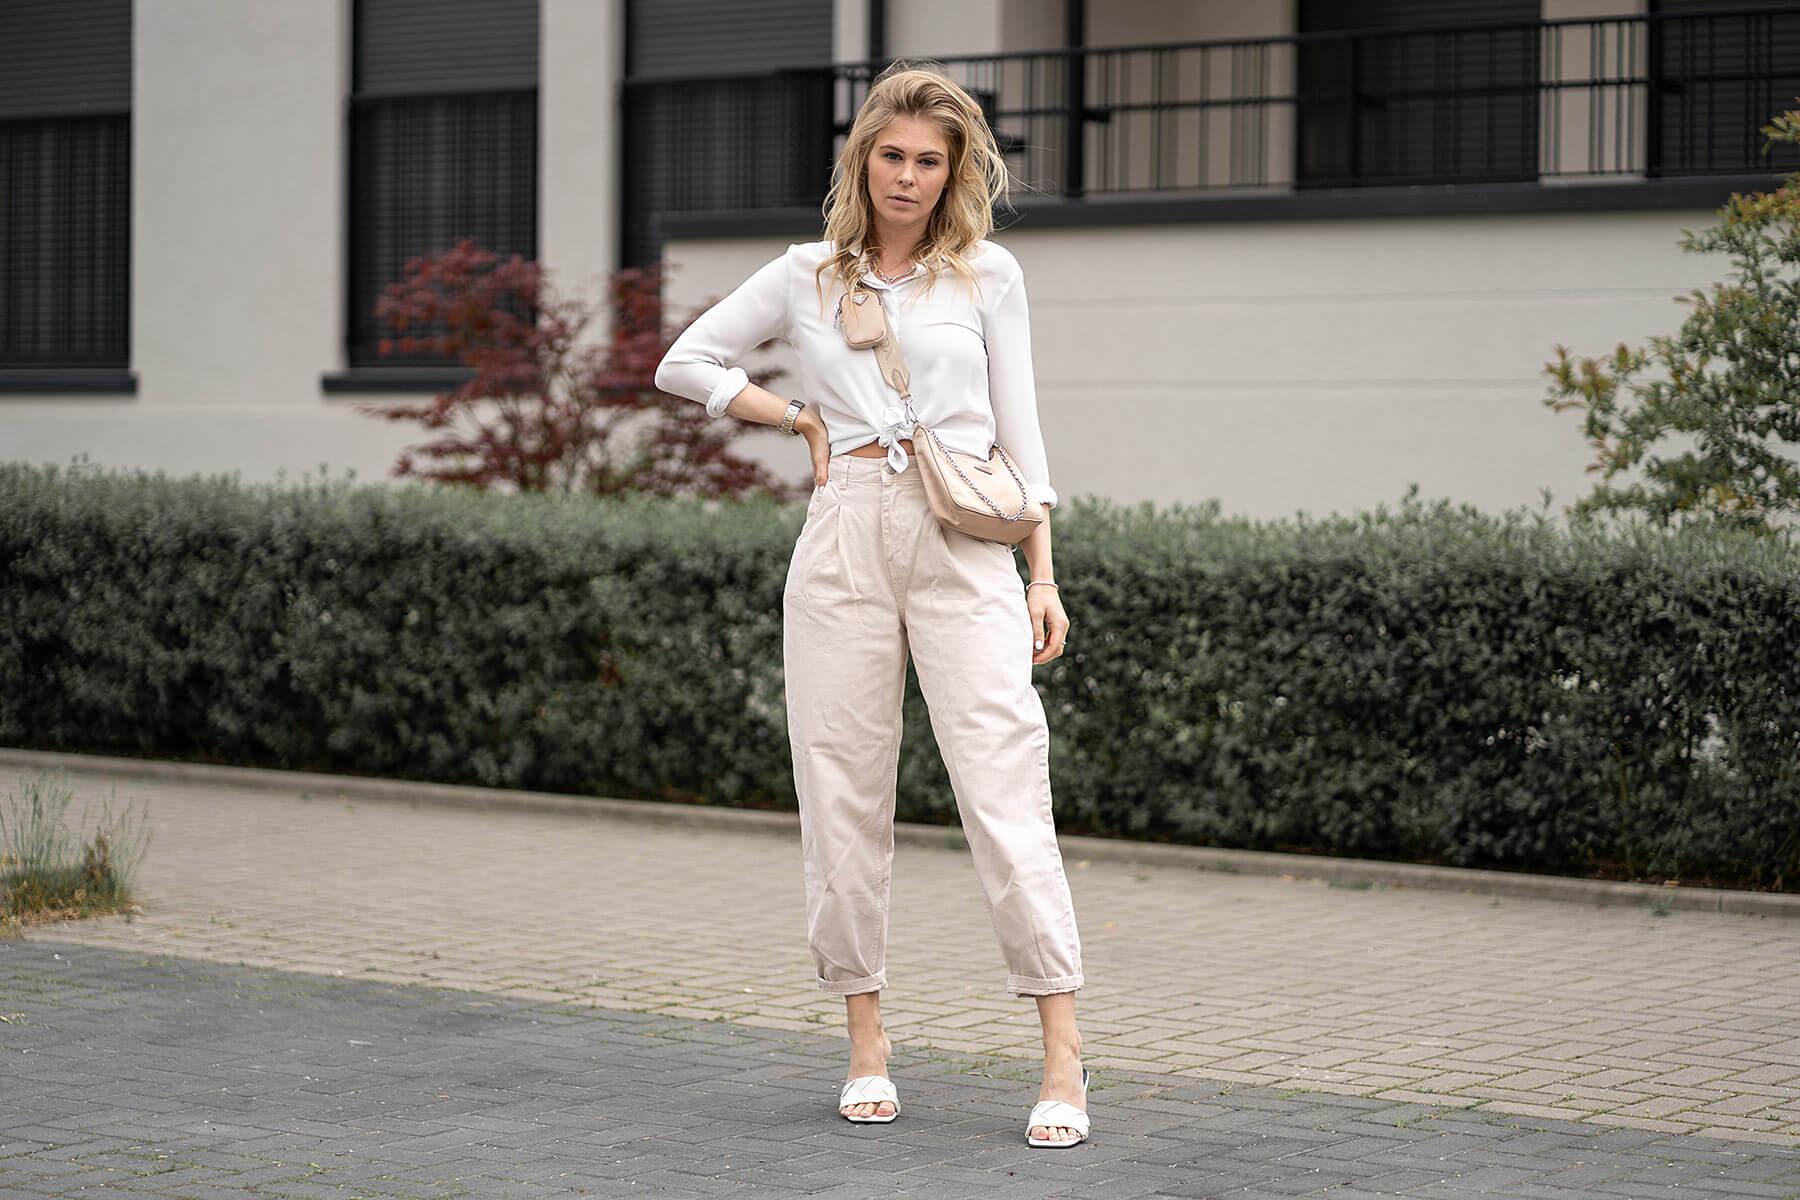 mules schuhtrend sommer fashion blogger inga brauer düsseldorf sunnyinga